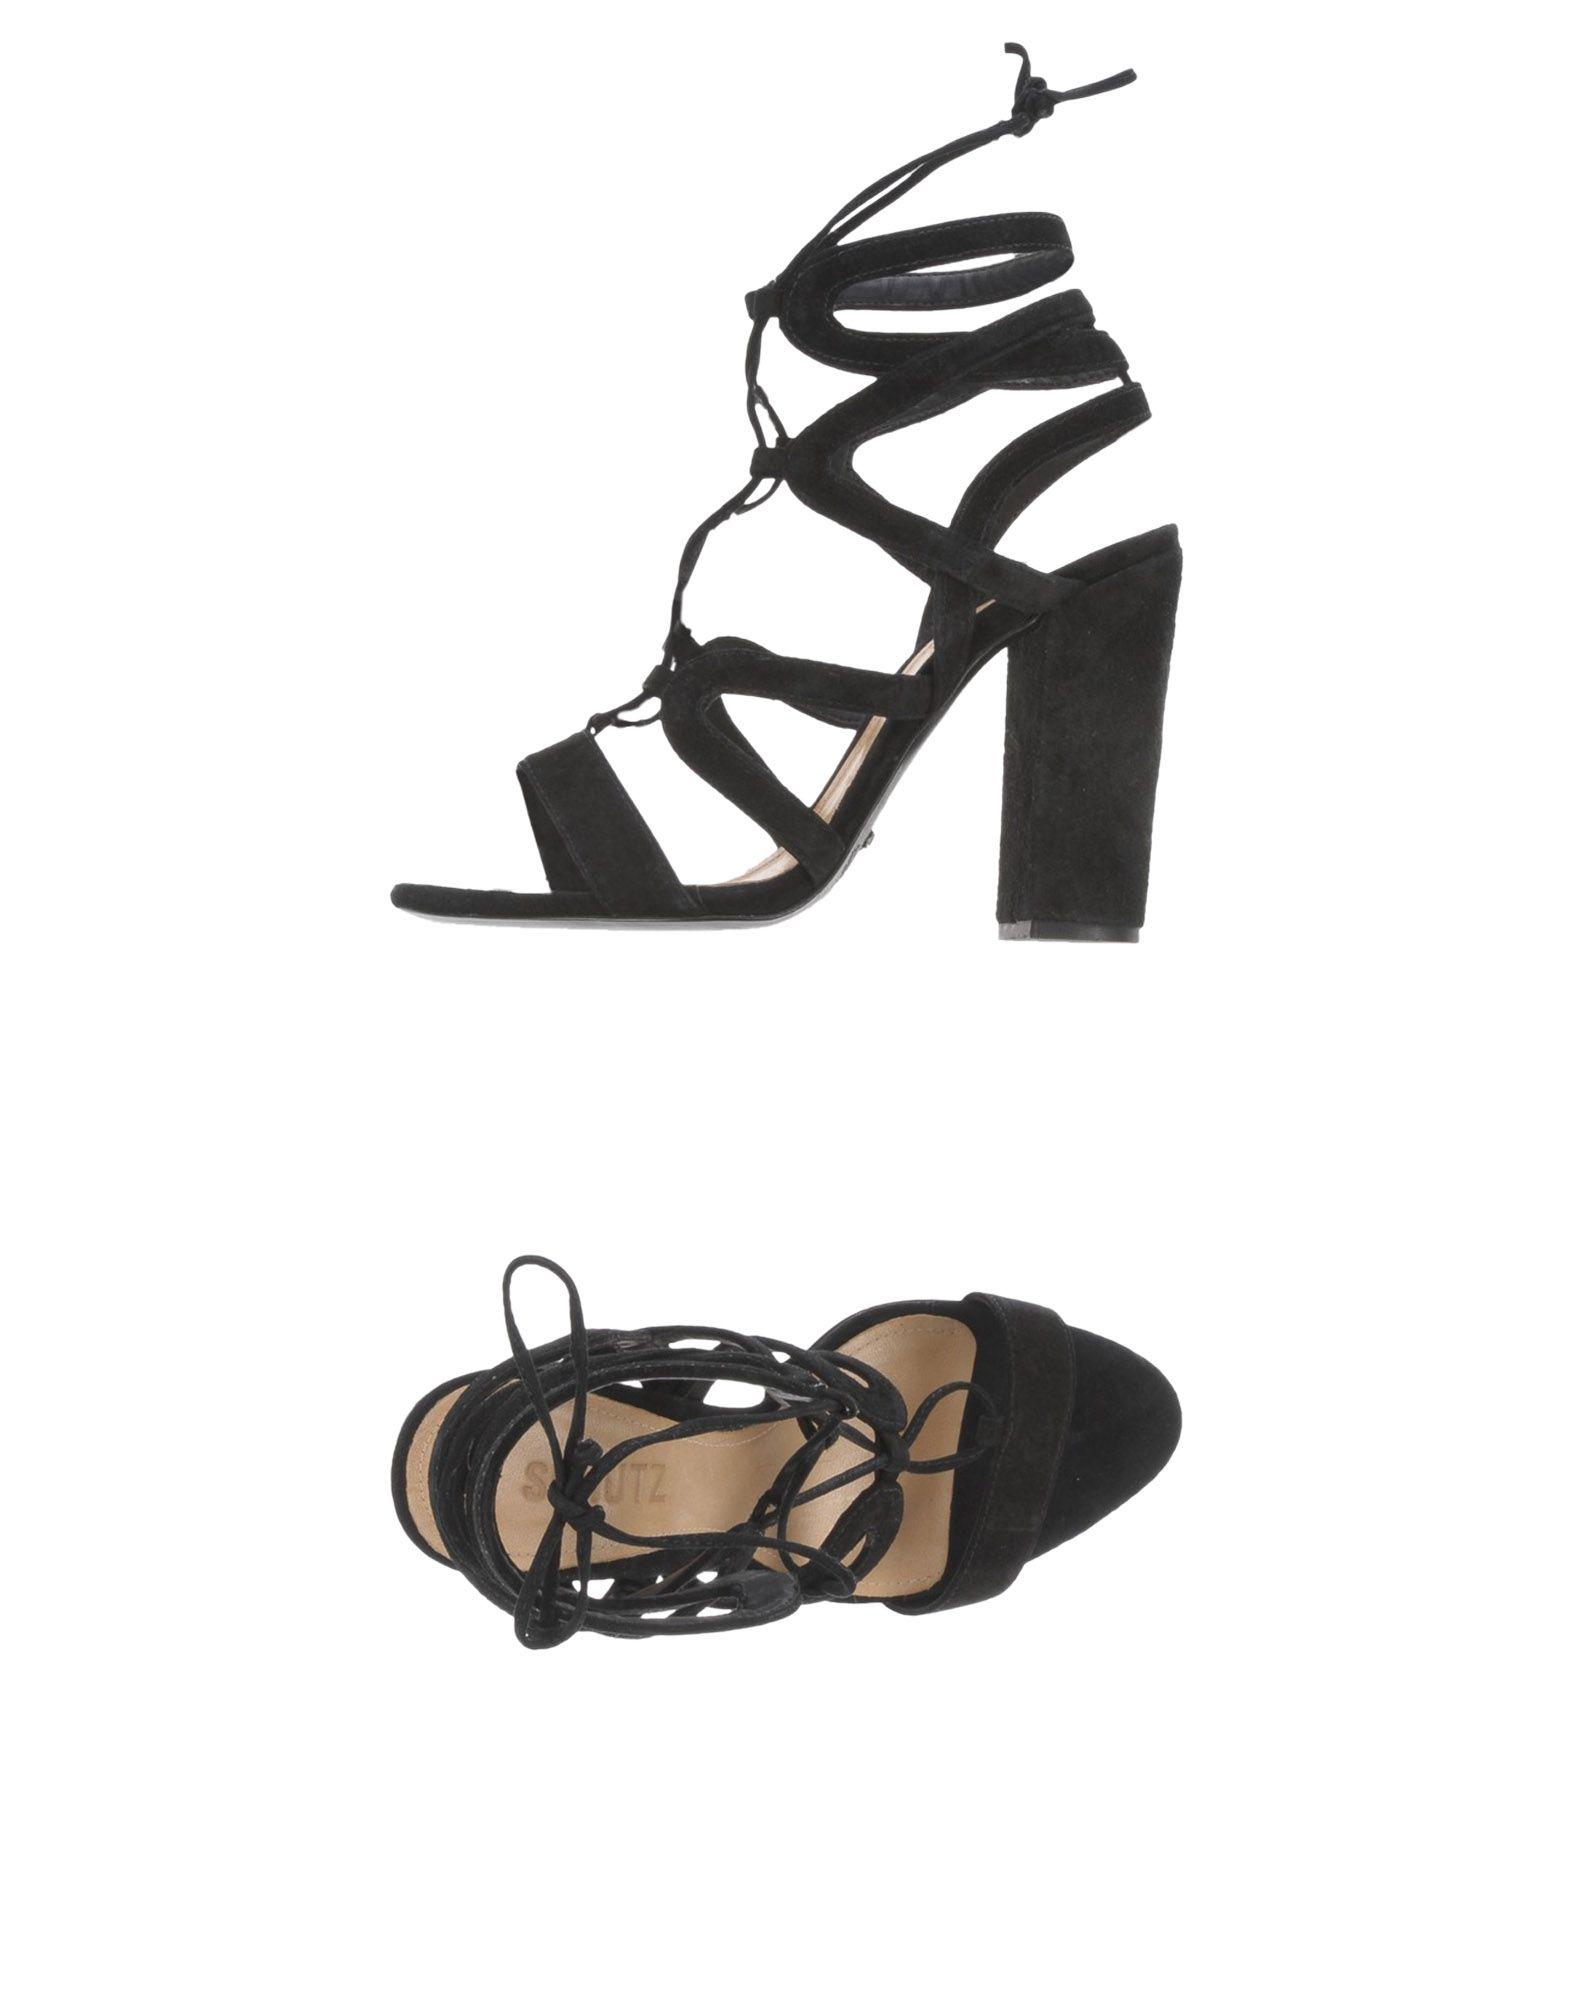 Schutz Sandalen Schuhe Damen  11464231JU Heiße Schuhe Sandalen 8c1f88